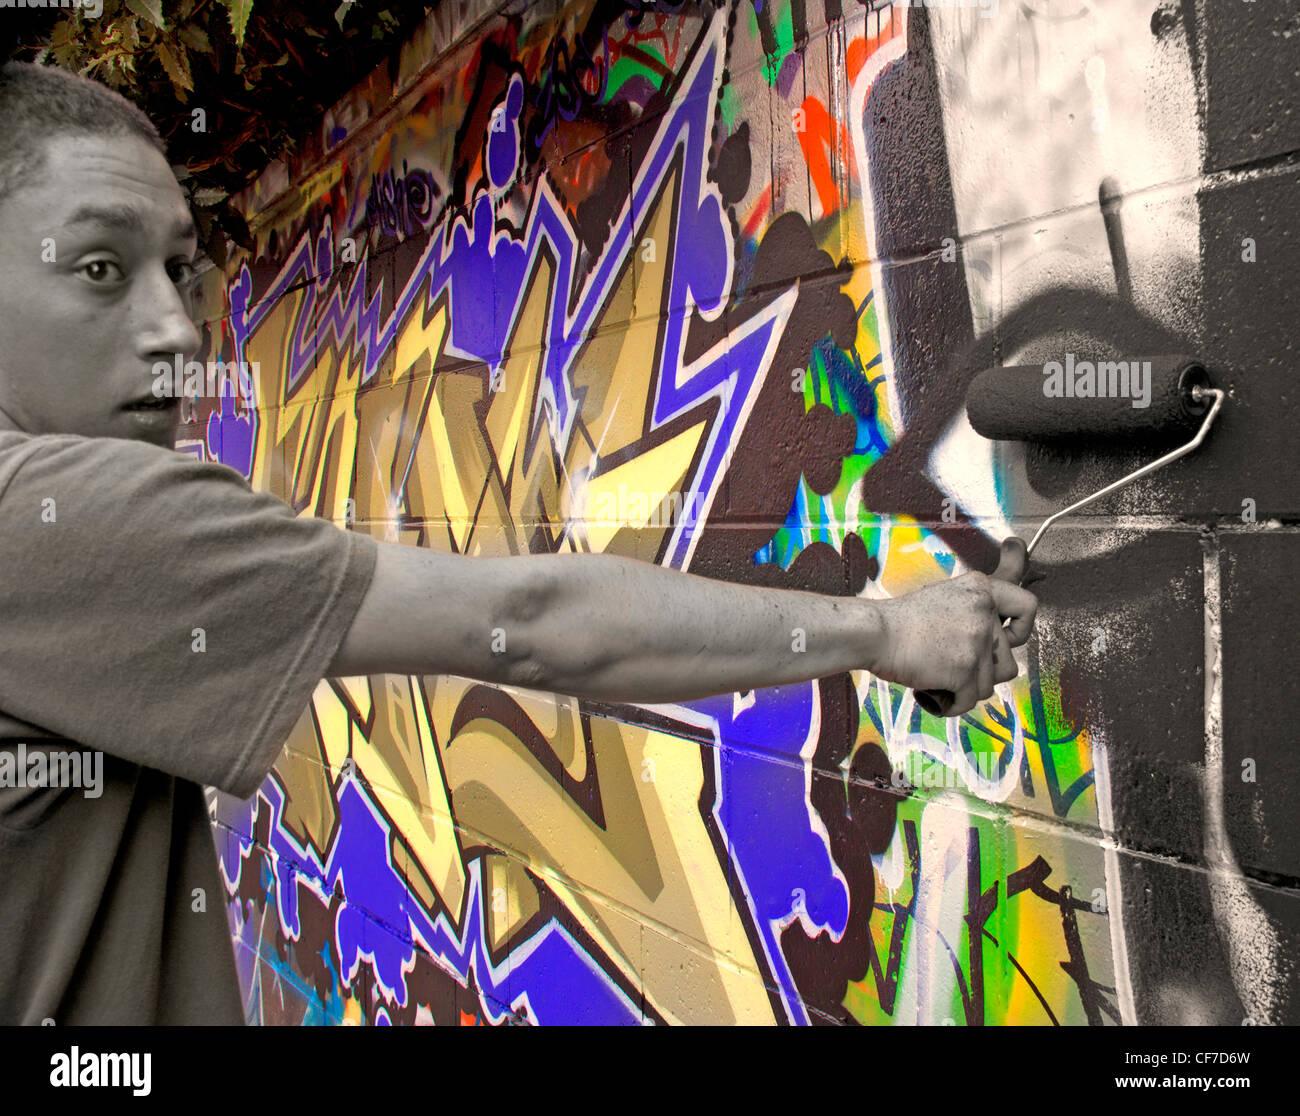 Removing,colourful,graffiti,with,a,paint,roller,covered,in,black,paint,Potterrow,Edinburgh,Lothian,Scotland,gotonysmith,uni,university,urban,hell,banksy,graffiti,artist,mono,monochrome,hero,LEcosse,Edimbourg,Schotland,Schottland,La,Scozia,Edimburgo,Escocia,Edimburgo,gotonysmith,Buy Pictures of,Buy Images Of